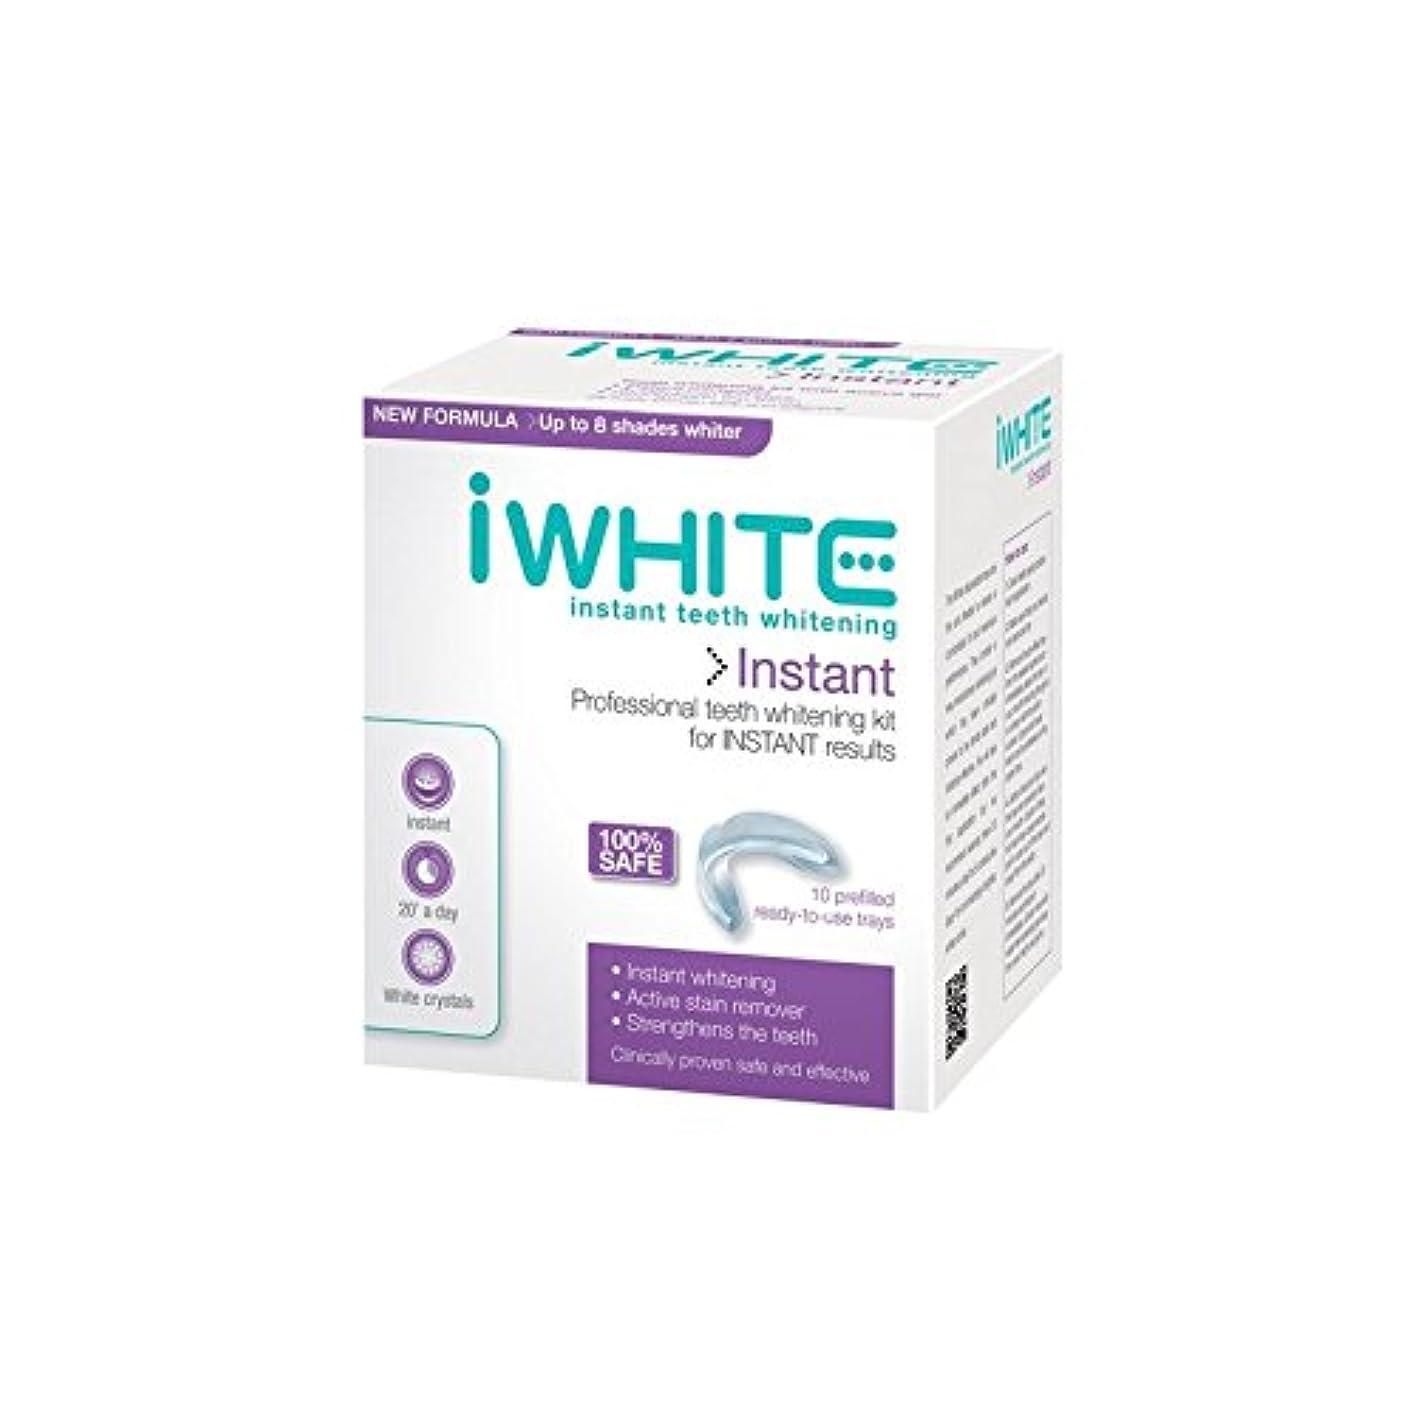 iWhite Instant Professional Teeth Whitening Kit (10 Trays) (Pack of 6) - キットを白くするインスタントプロの歯(10個のトレー) x6 [並行輸入品]